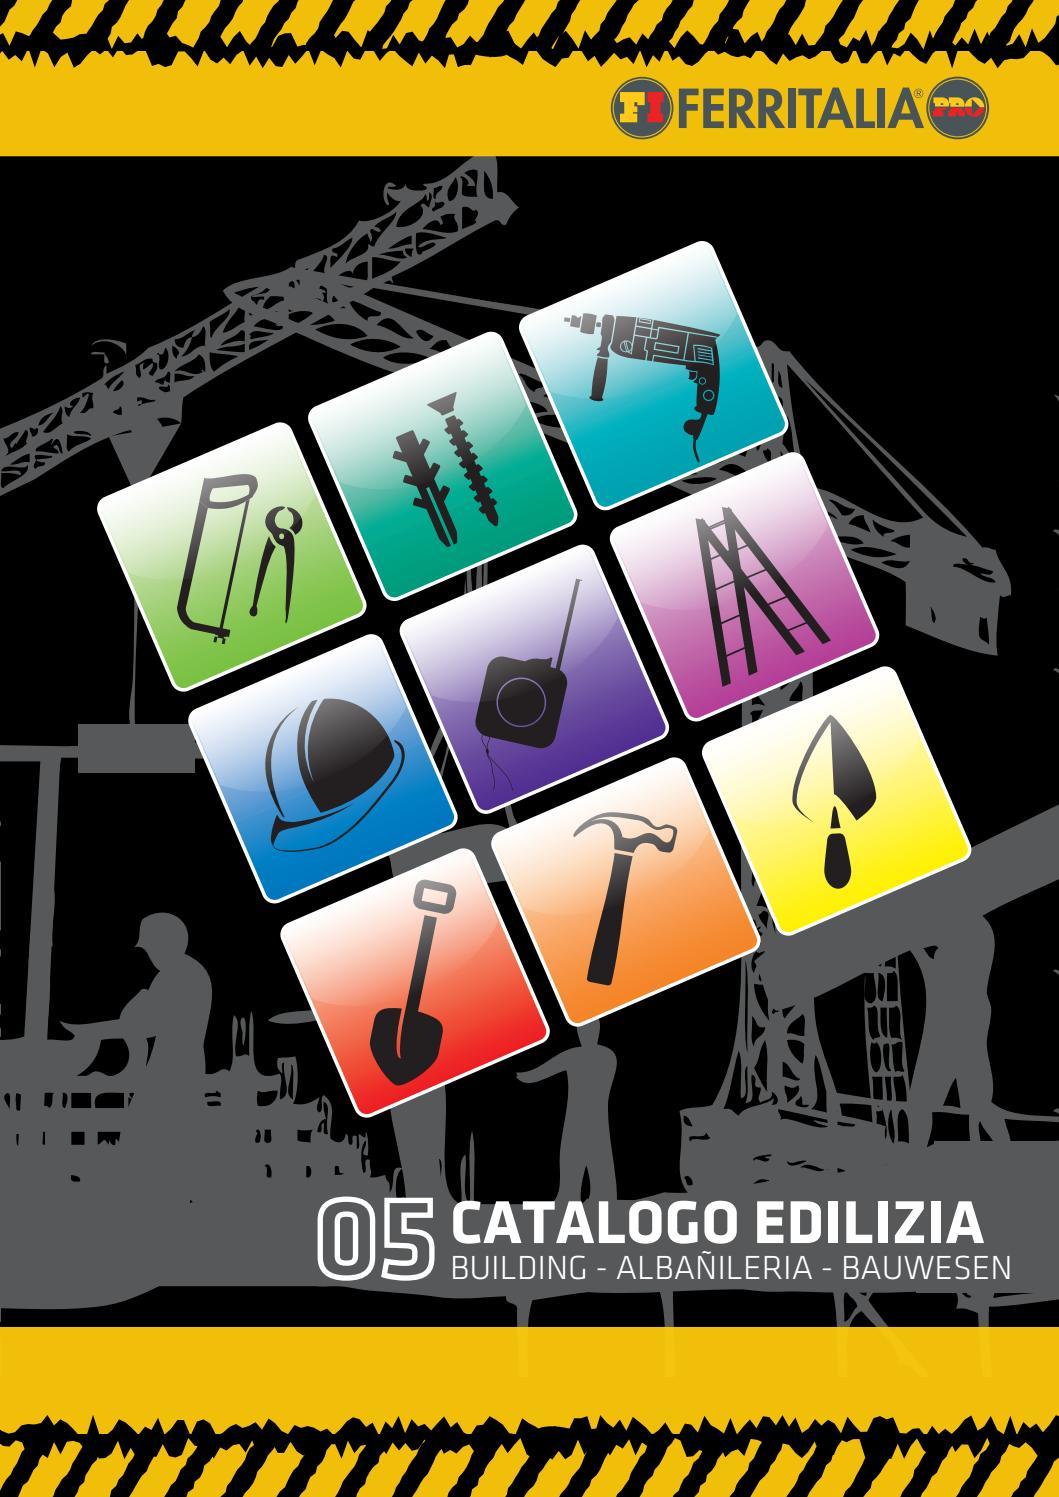 bf18c193e2 Catalogo Edilizia by Oggiweb Srl - issuu